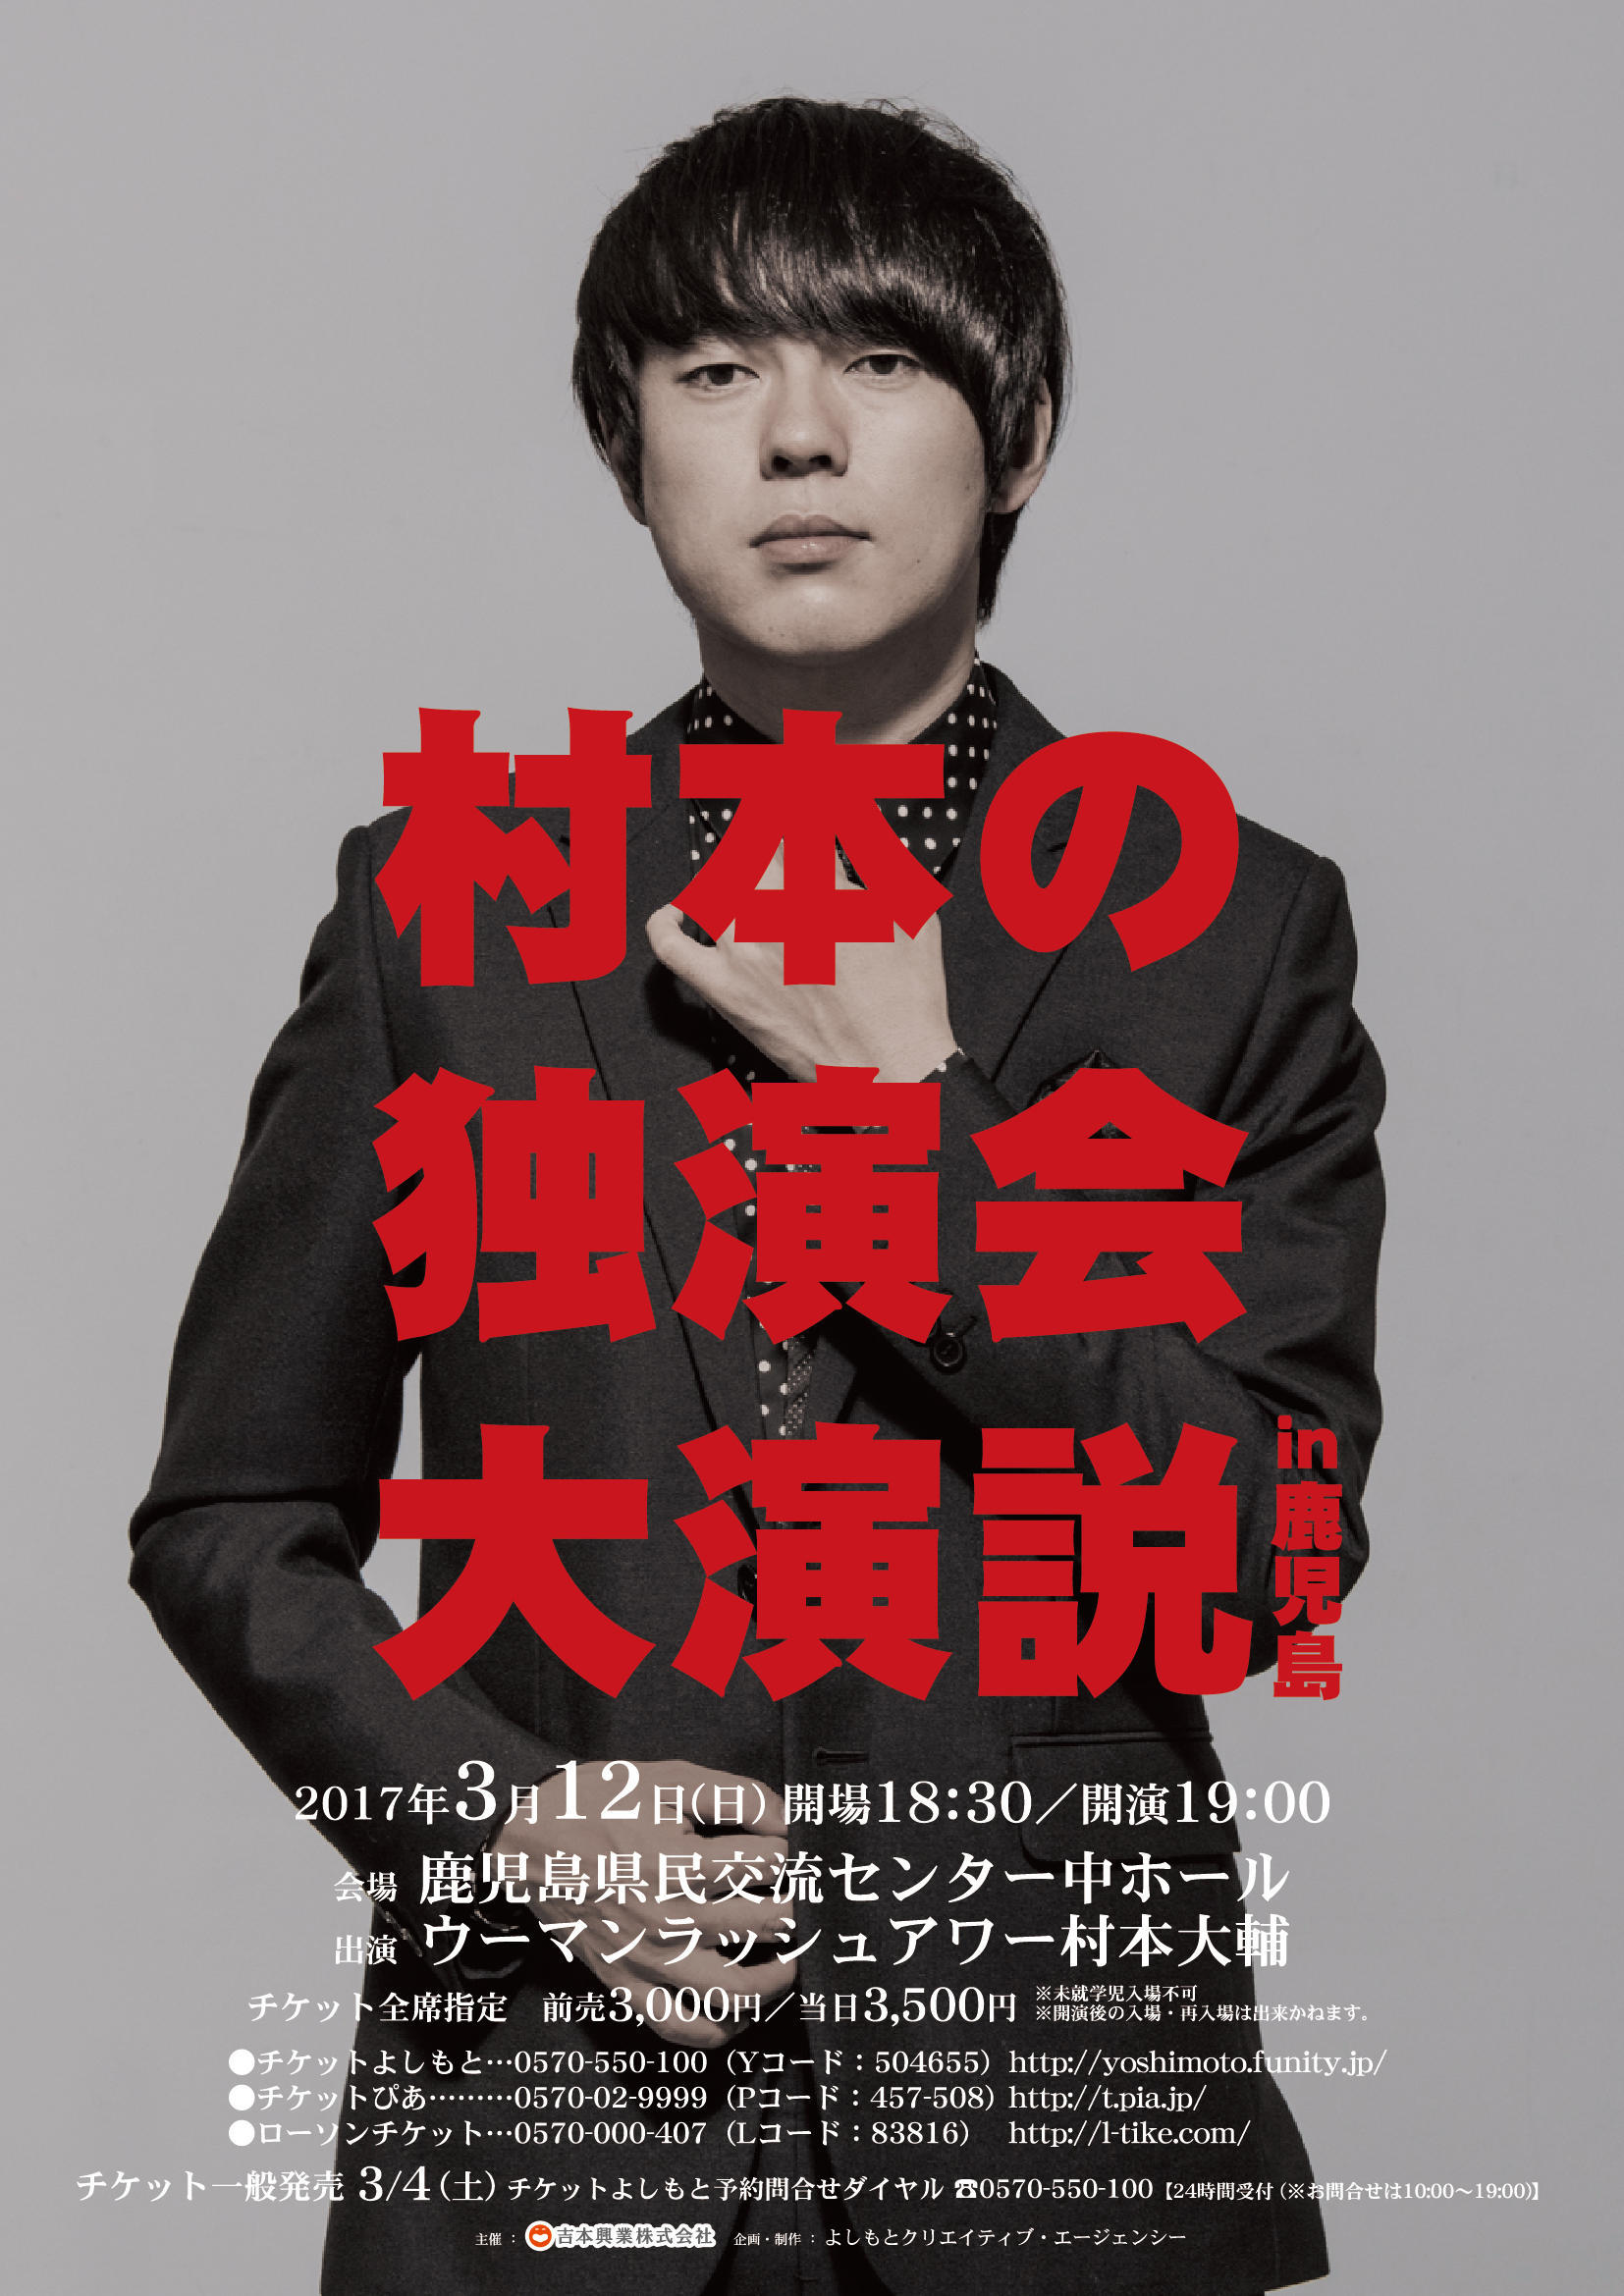 http://www.syumatsu.jp/20170309182559-e423e587714db106cc54f29f4ef0e95be9a22e71.jpg